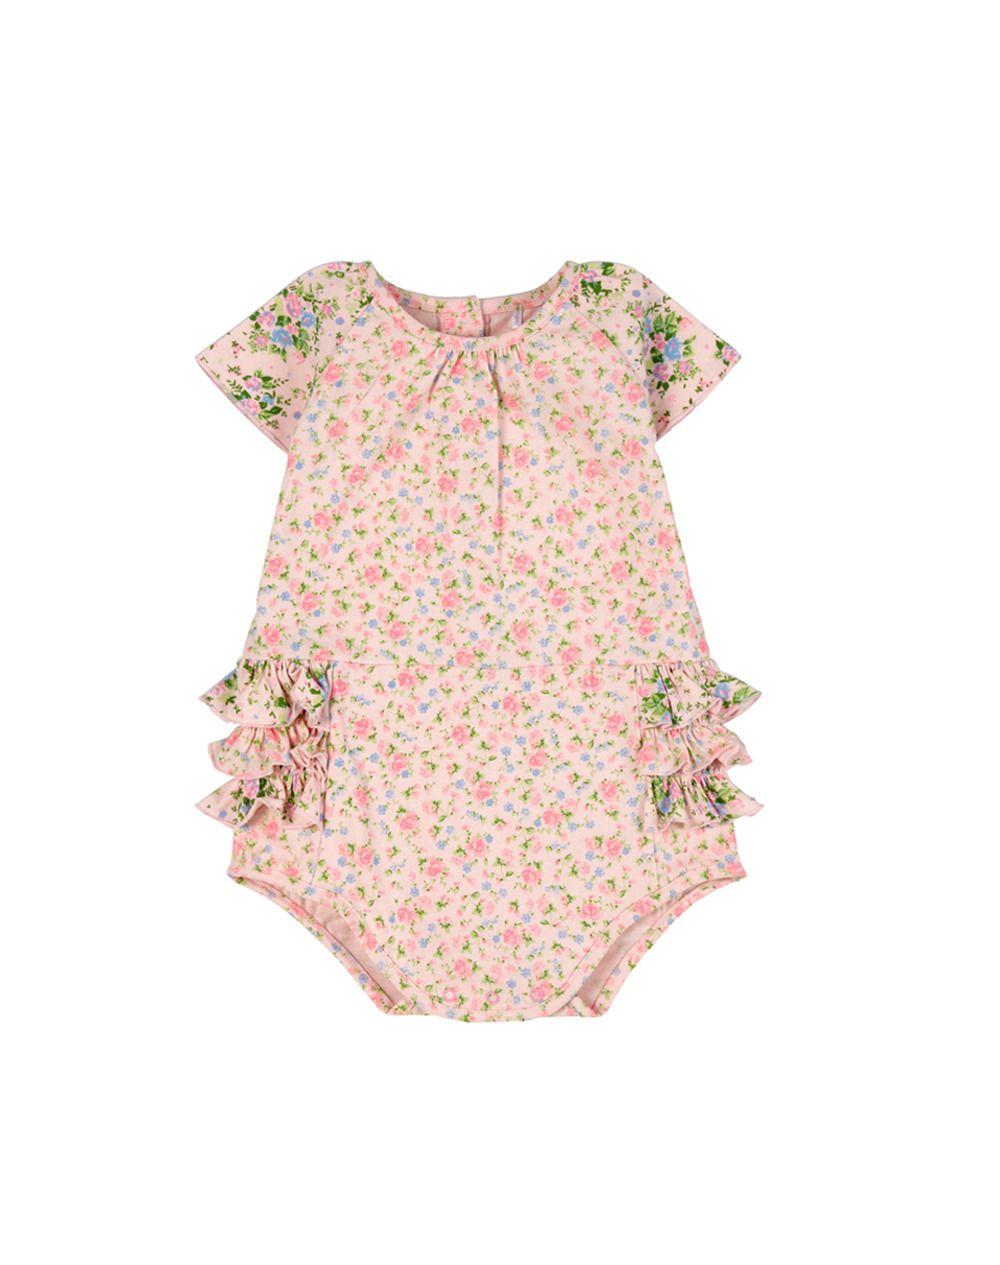 a9b2940d5cd Pelele de bebé niña Dulces - Niña - Peleles y polainas - El Corte Inglés -